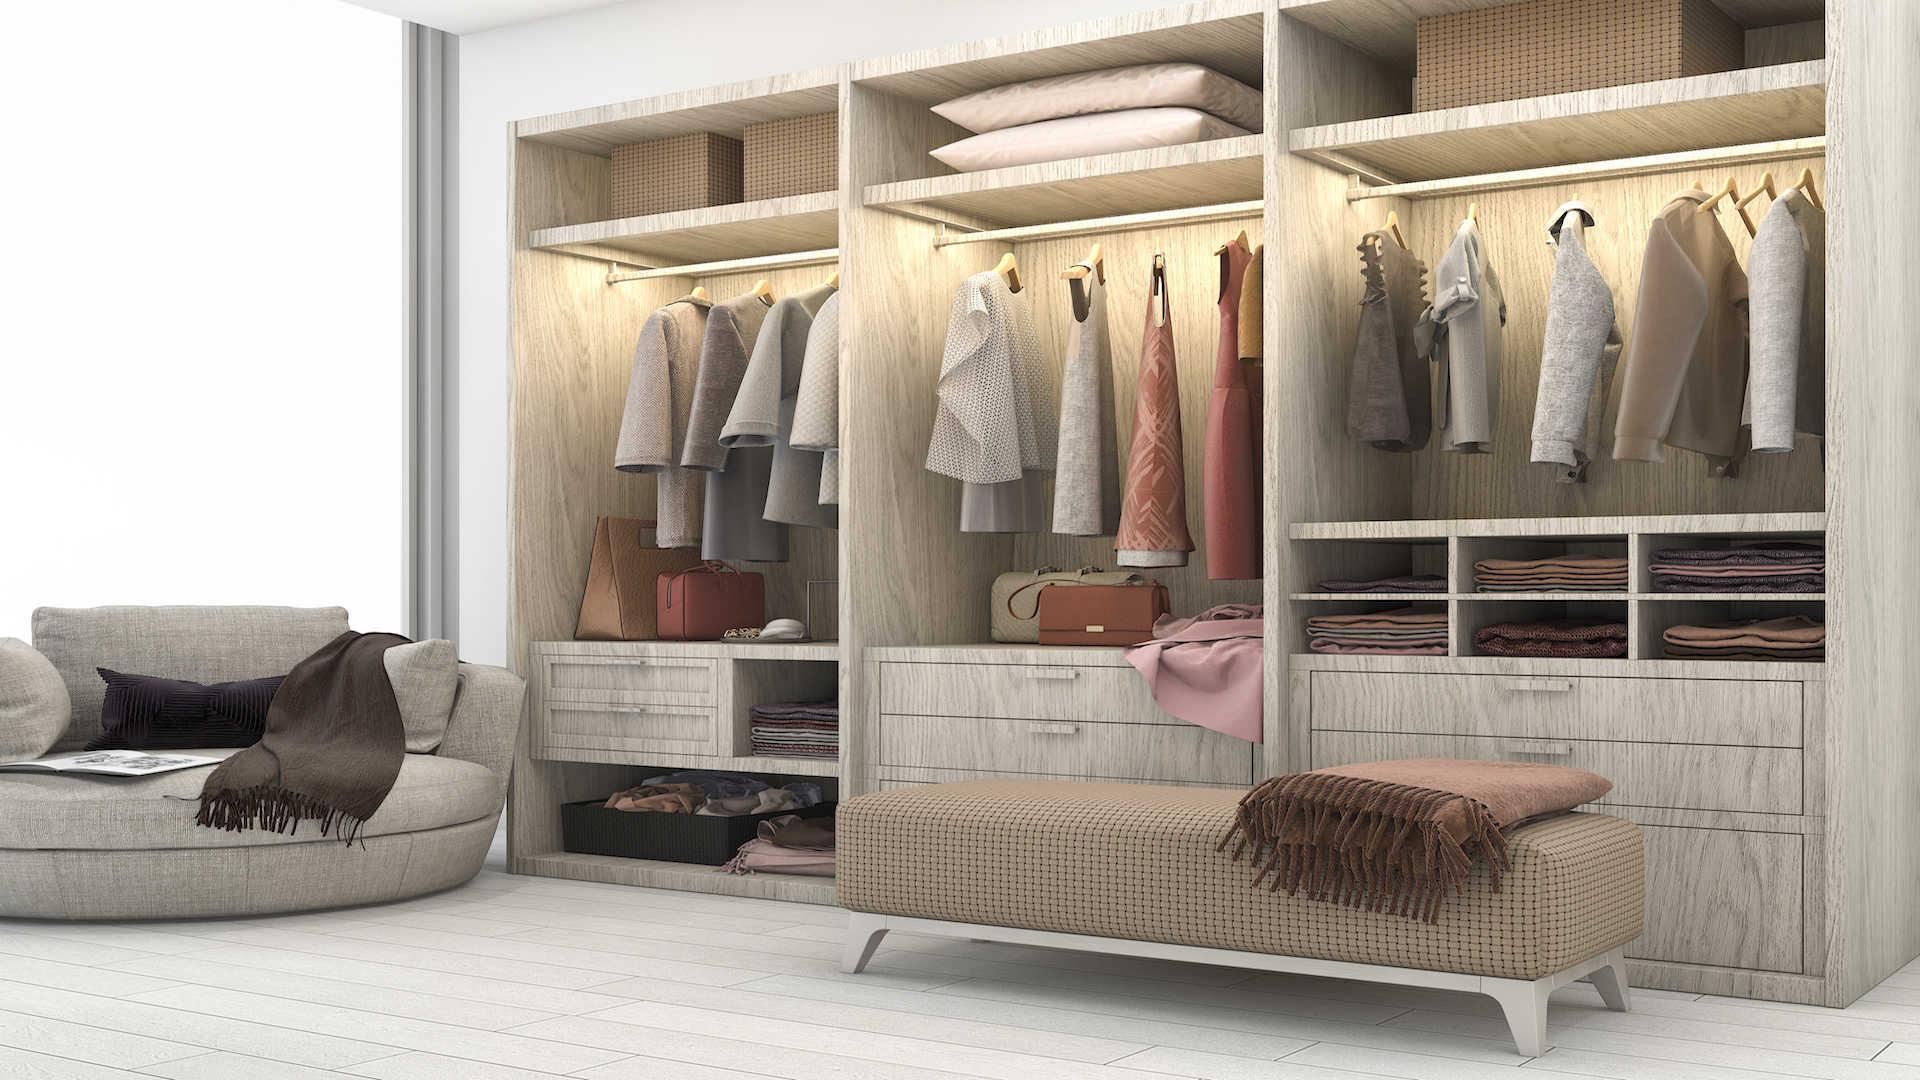 Montage d'armoire, dressing ou penderie